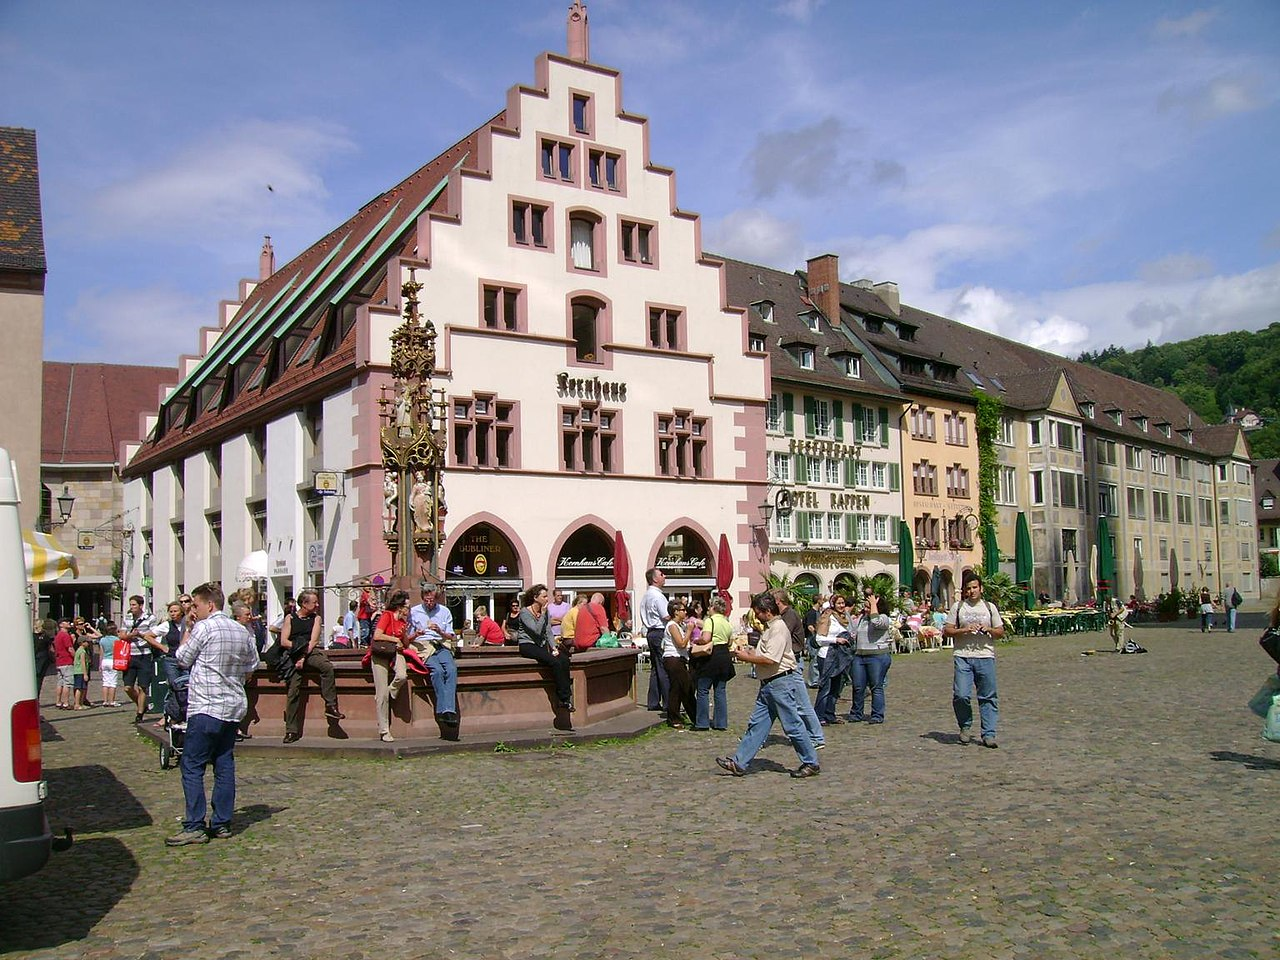 Blind Date in Freiburg im Breisgau